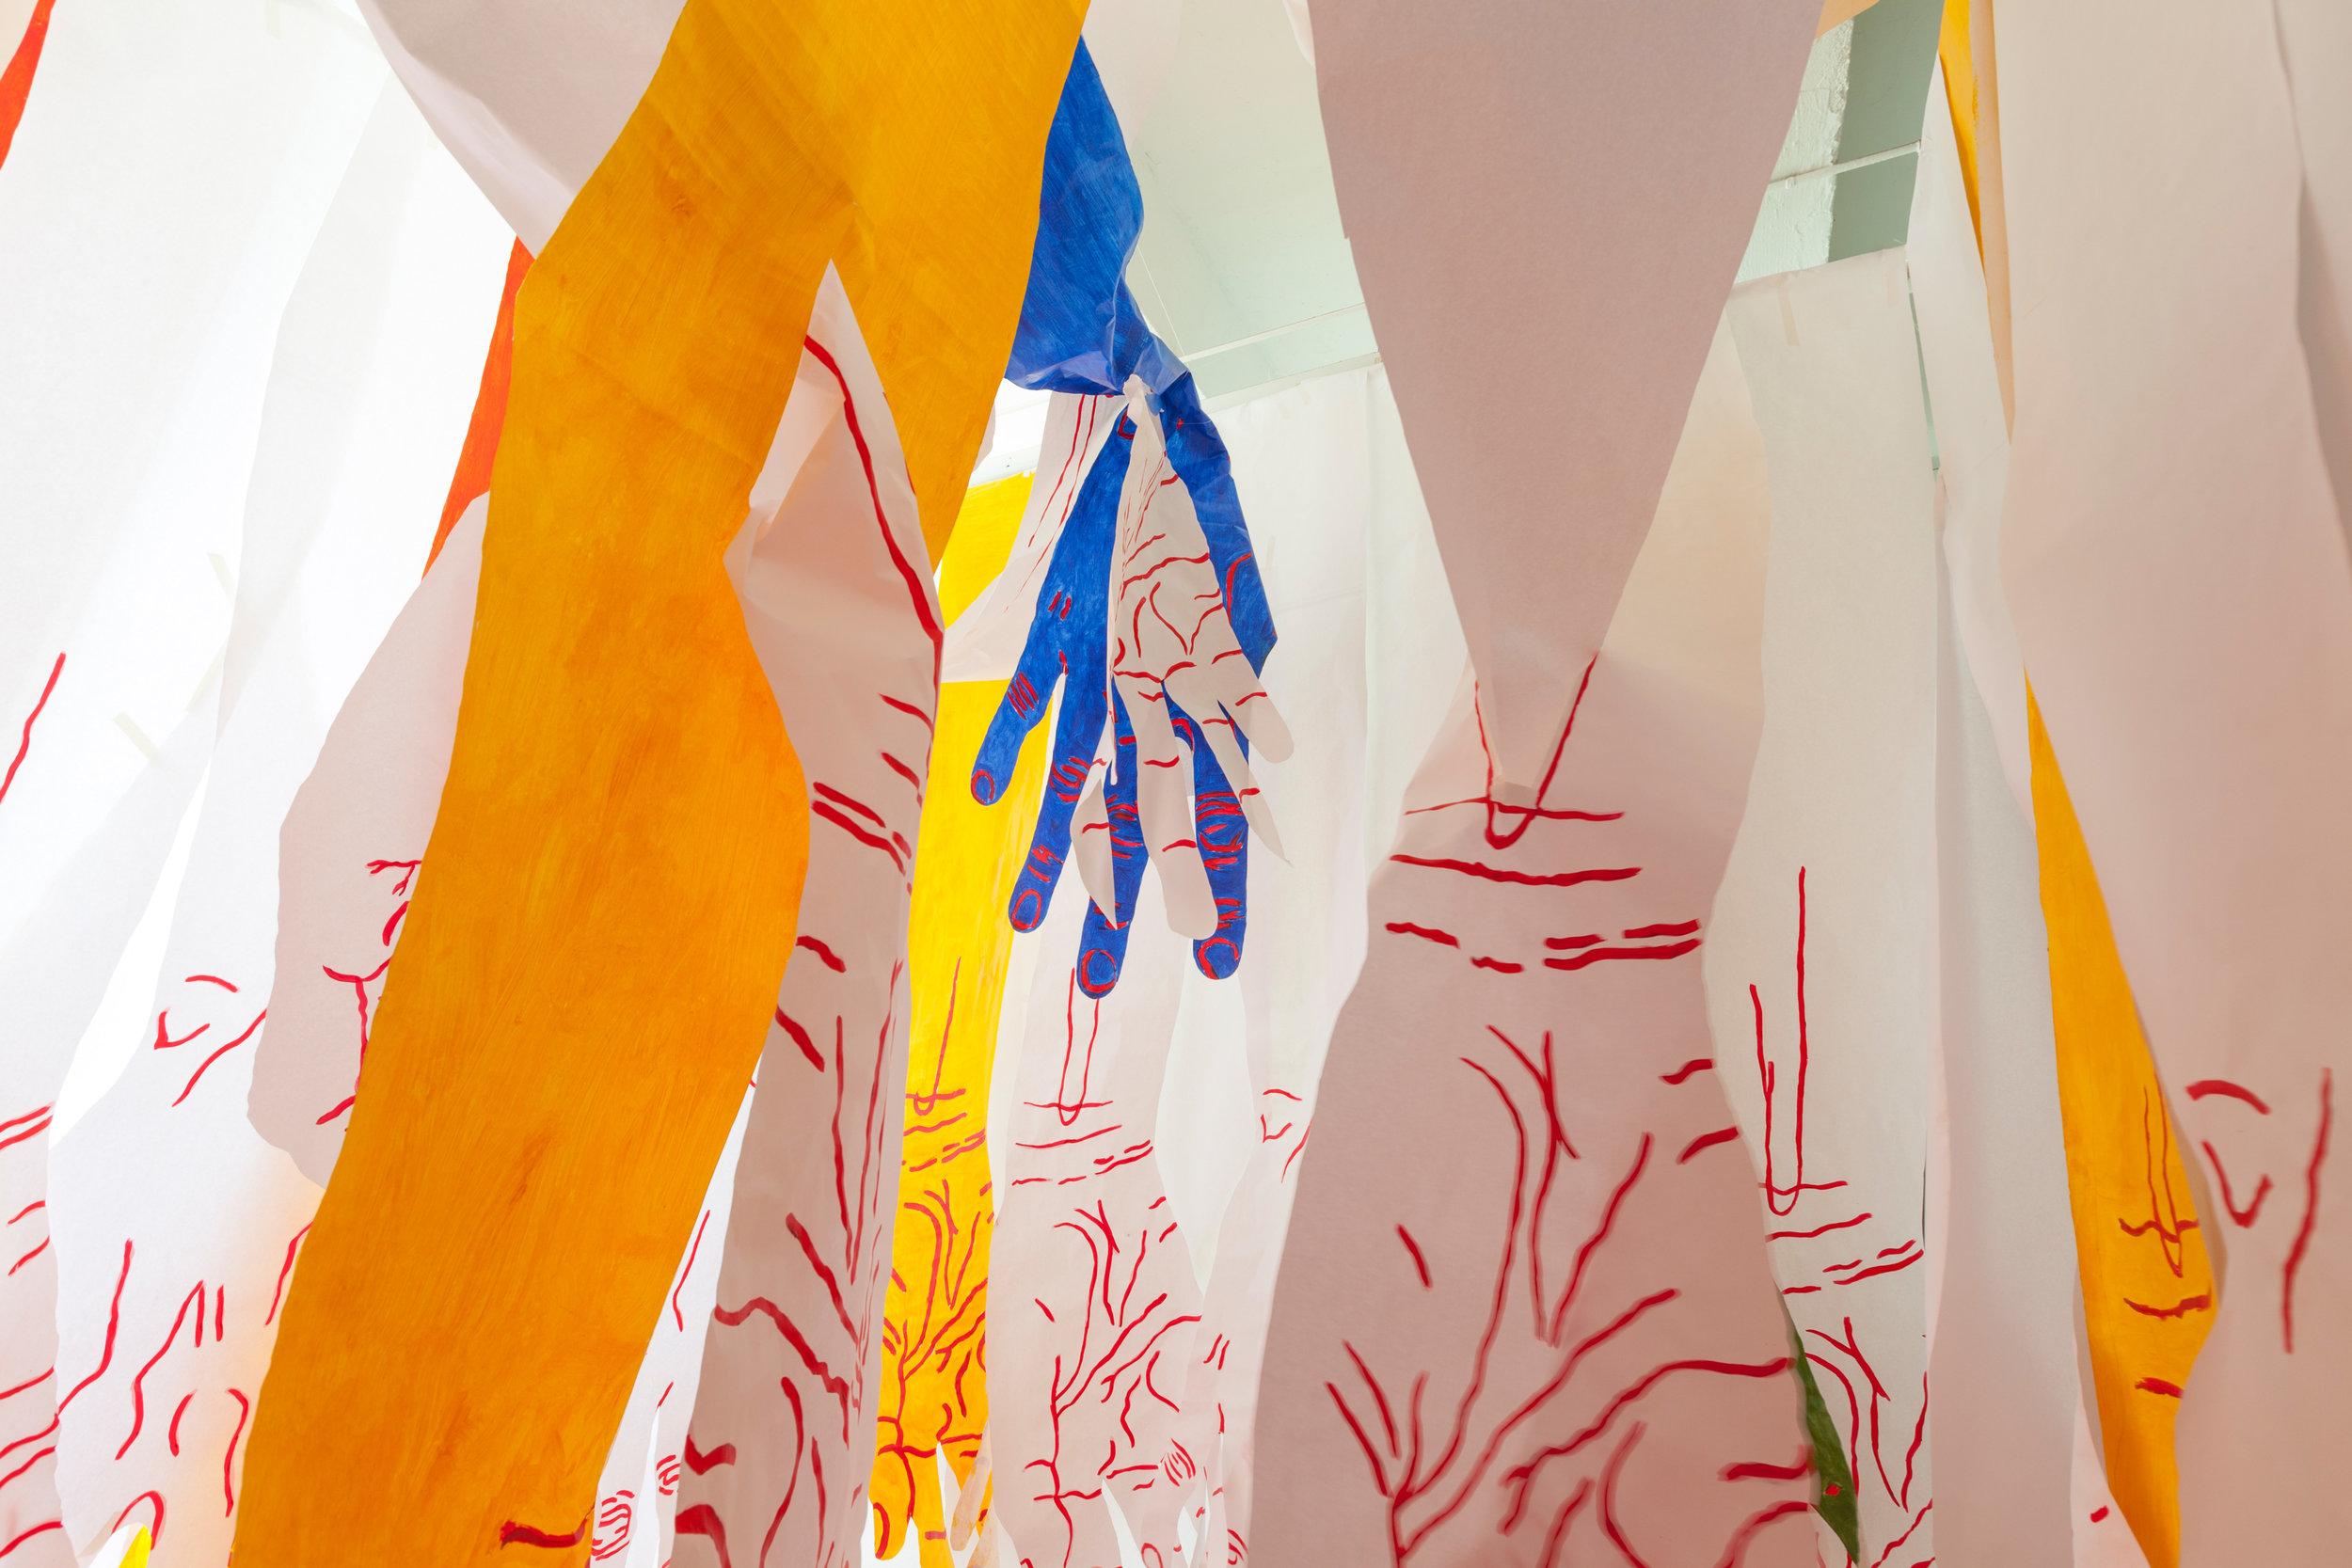 hands-tesseract-tangled-up-hands-mirena-rhee-installation_07.jpg